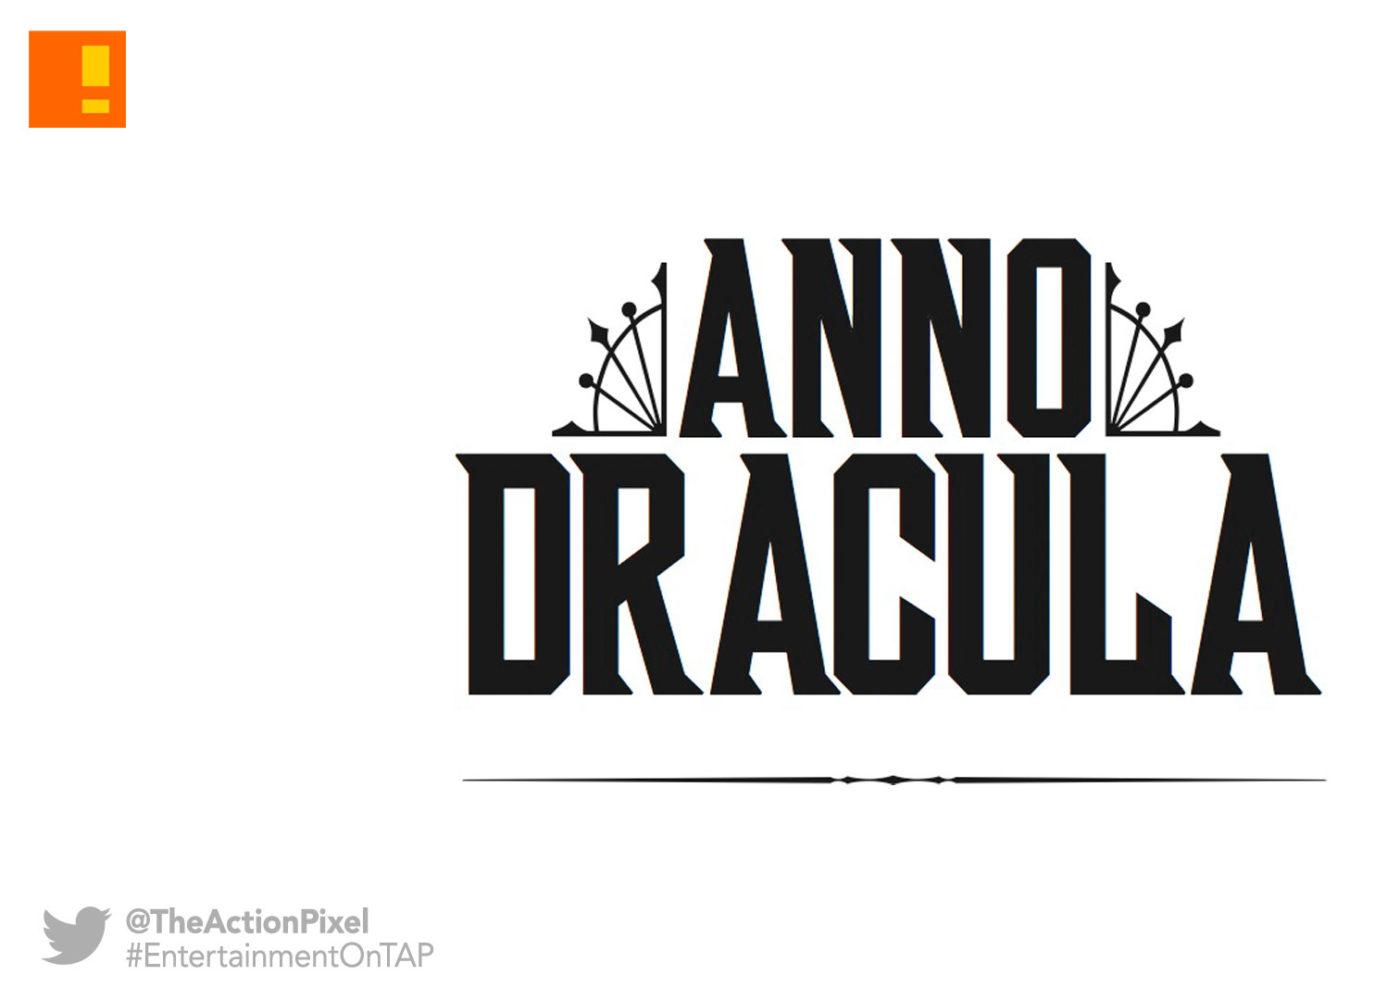 anno dracula, kim newman, titan comics, the action pixel, entertainment on tap